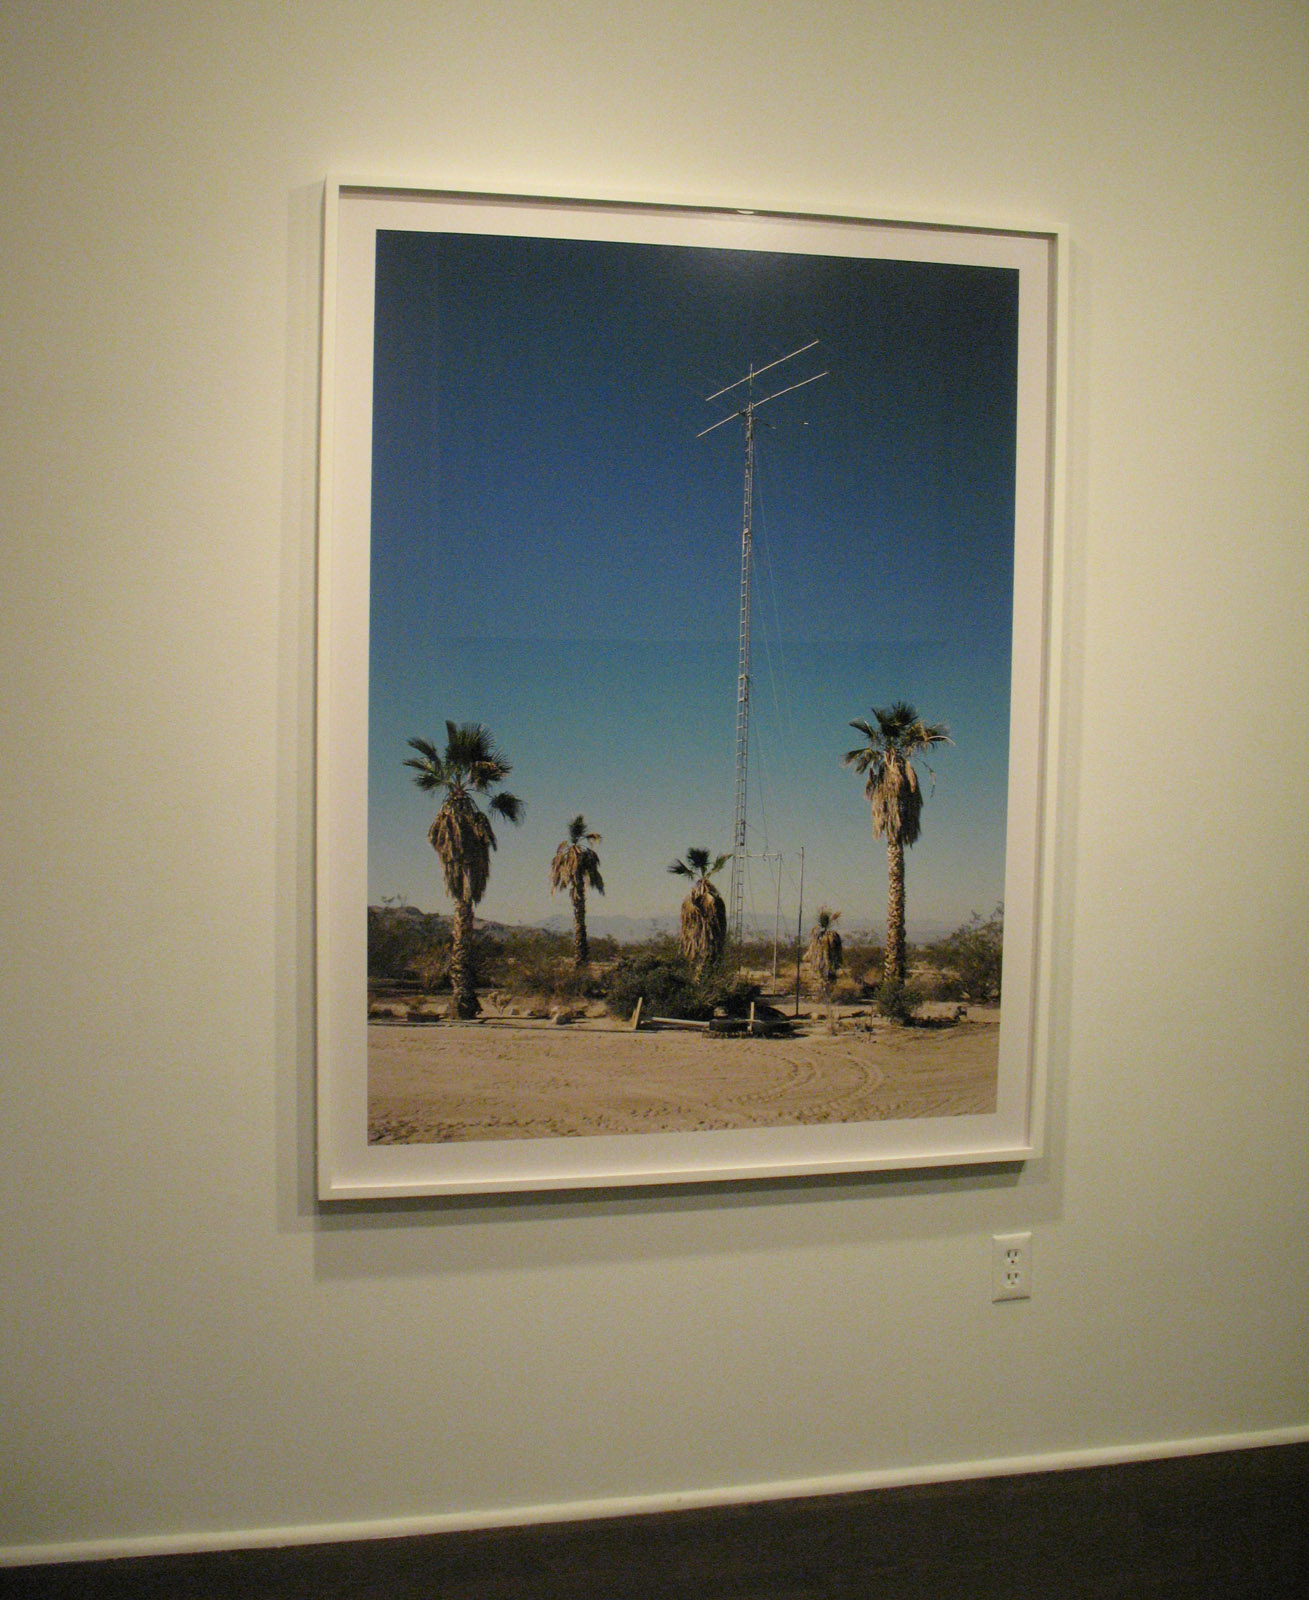 Cindy Bernard, Silent Key, Tracy Williams LTD, 2008 Installation views